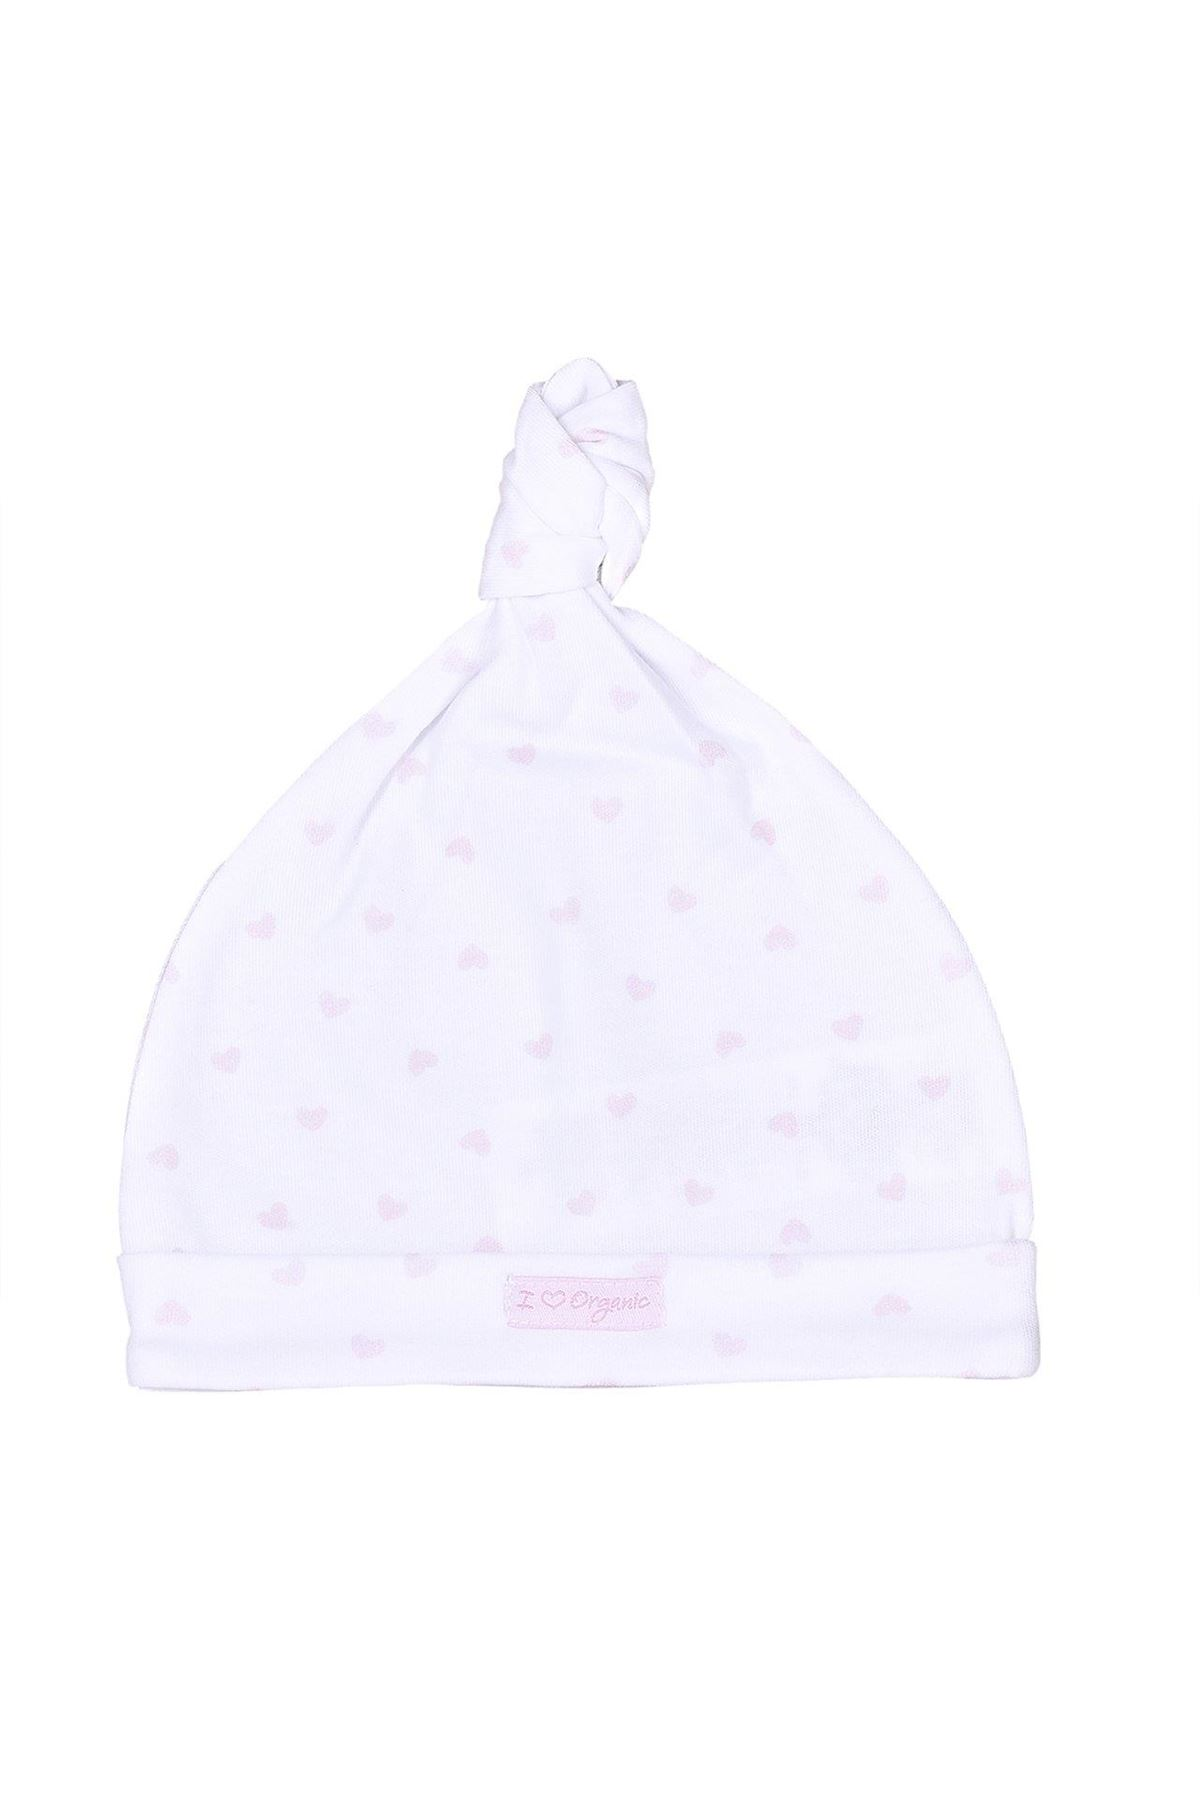 KitiKate Organik Dreams Bağlamalı Şapka 15928 Pembe Kalp